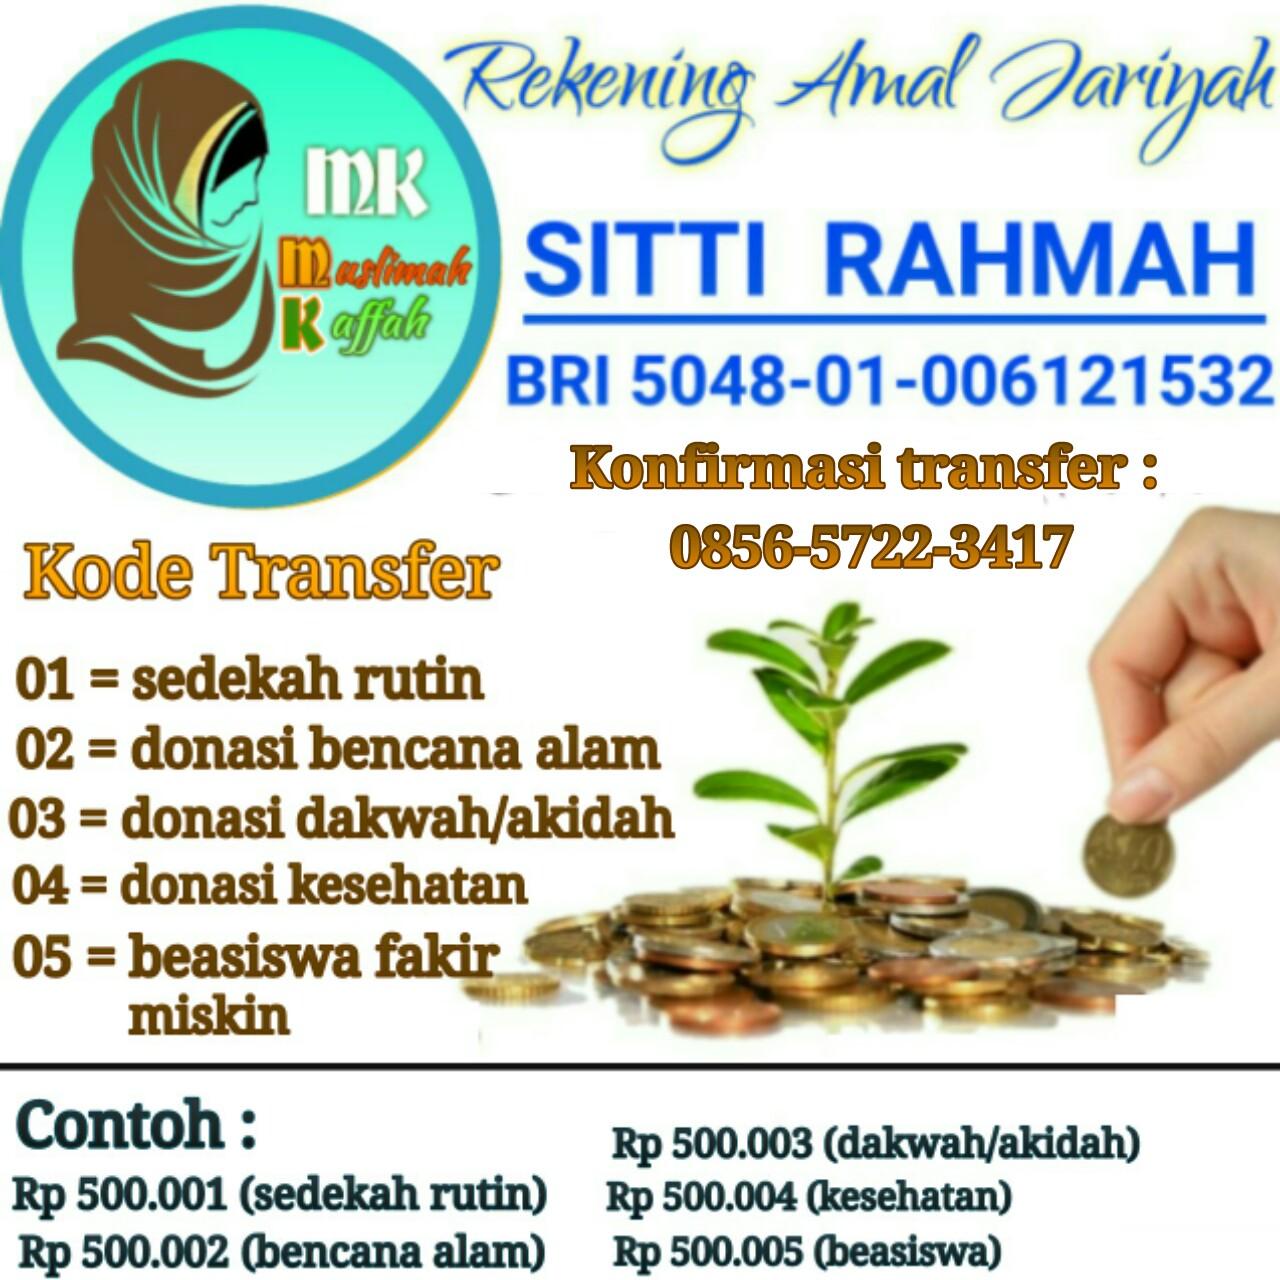 Rekening Amal Jariyah Muslimah Kaffah